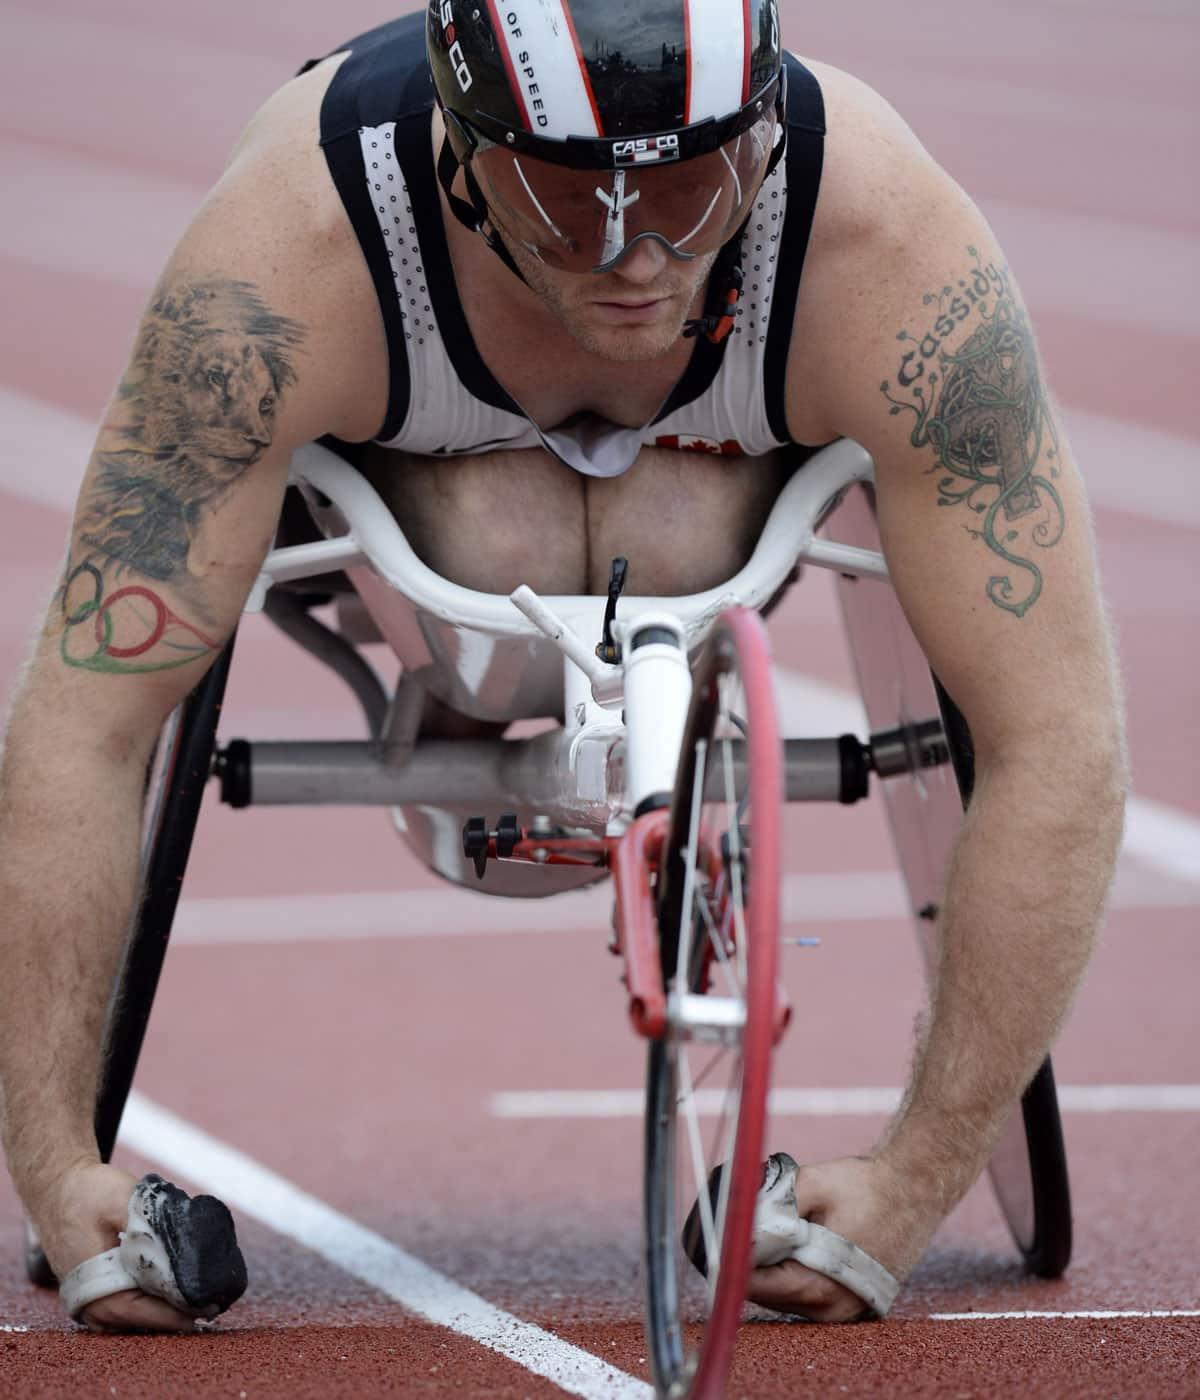 Josh Cassidy: This guy's got wheels